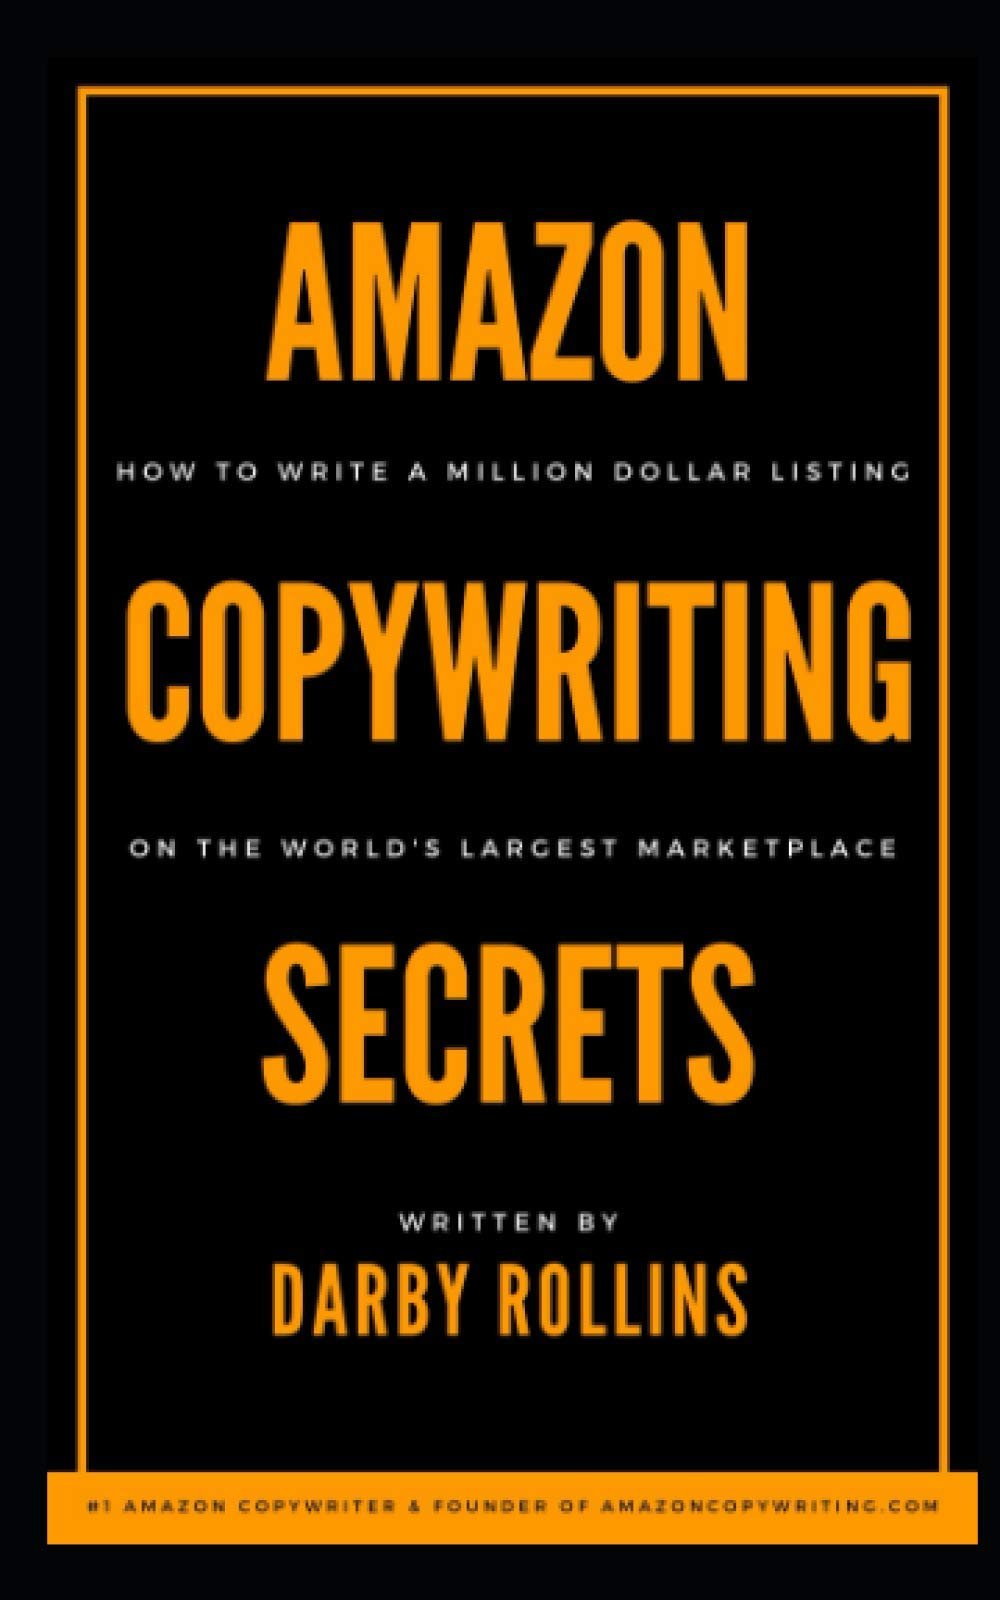 Amazon Copywriting Secret